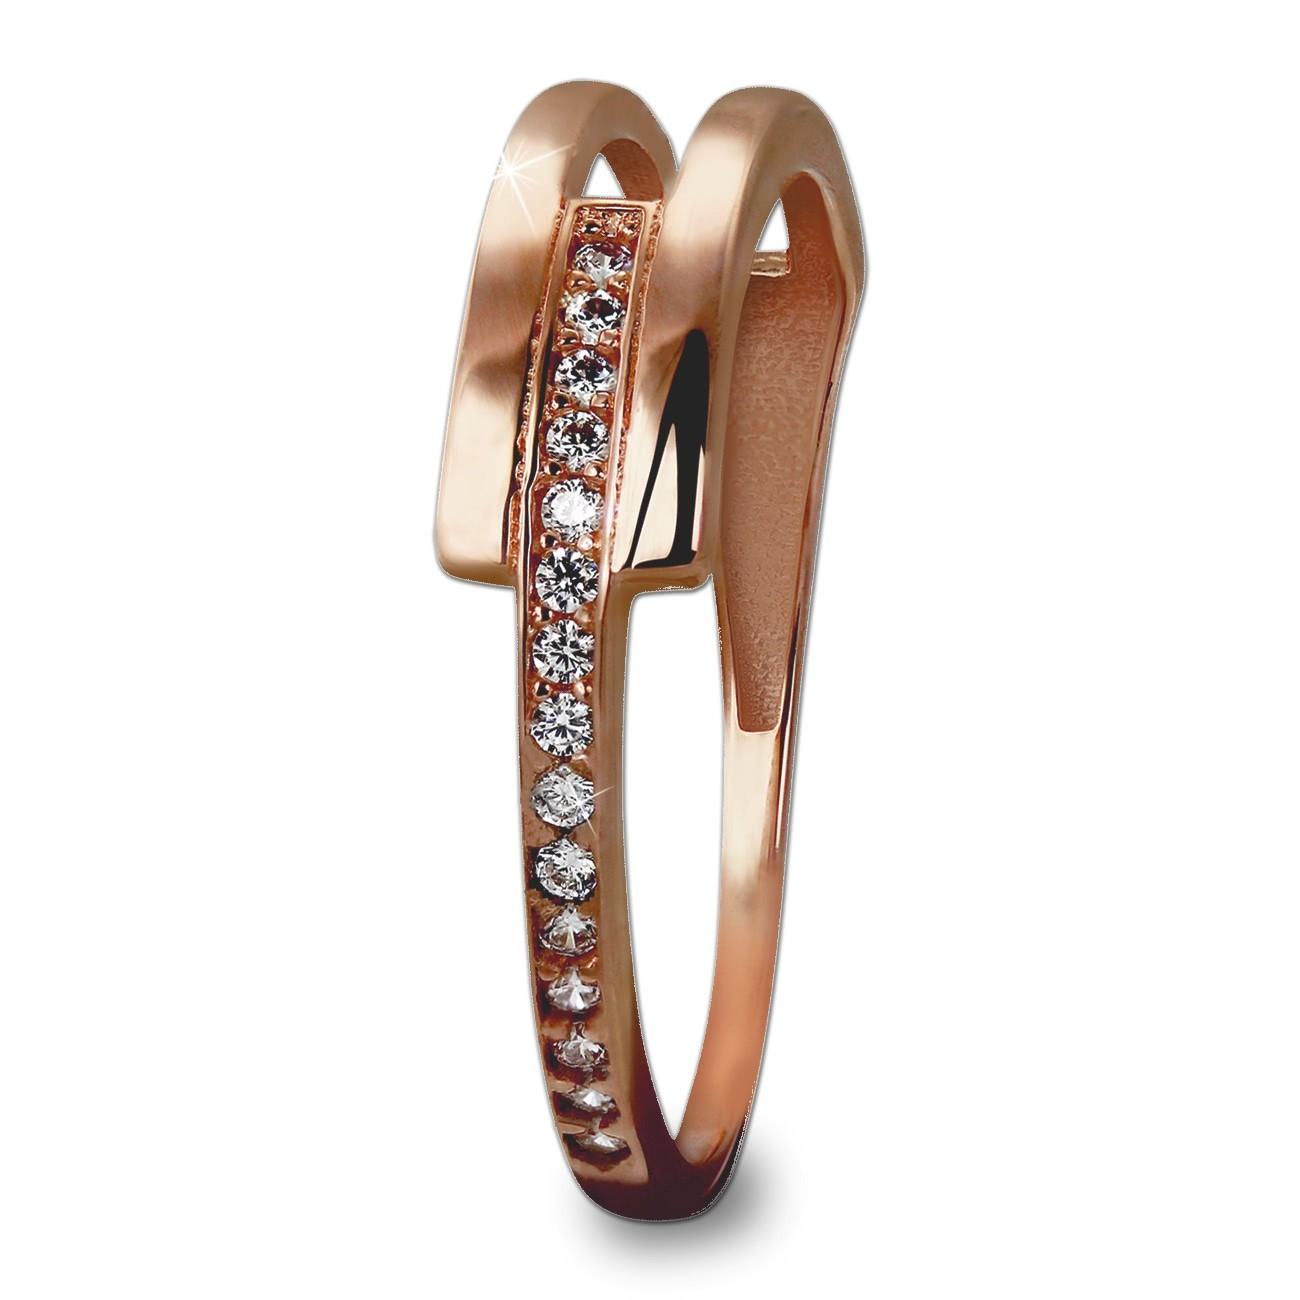 GoldDream Gold Ring Gr.60 Zirkonia weiß 333er Rosegold GDR526E60